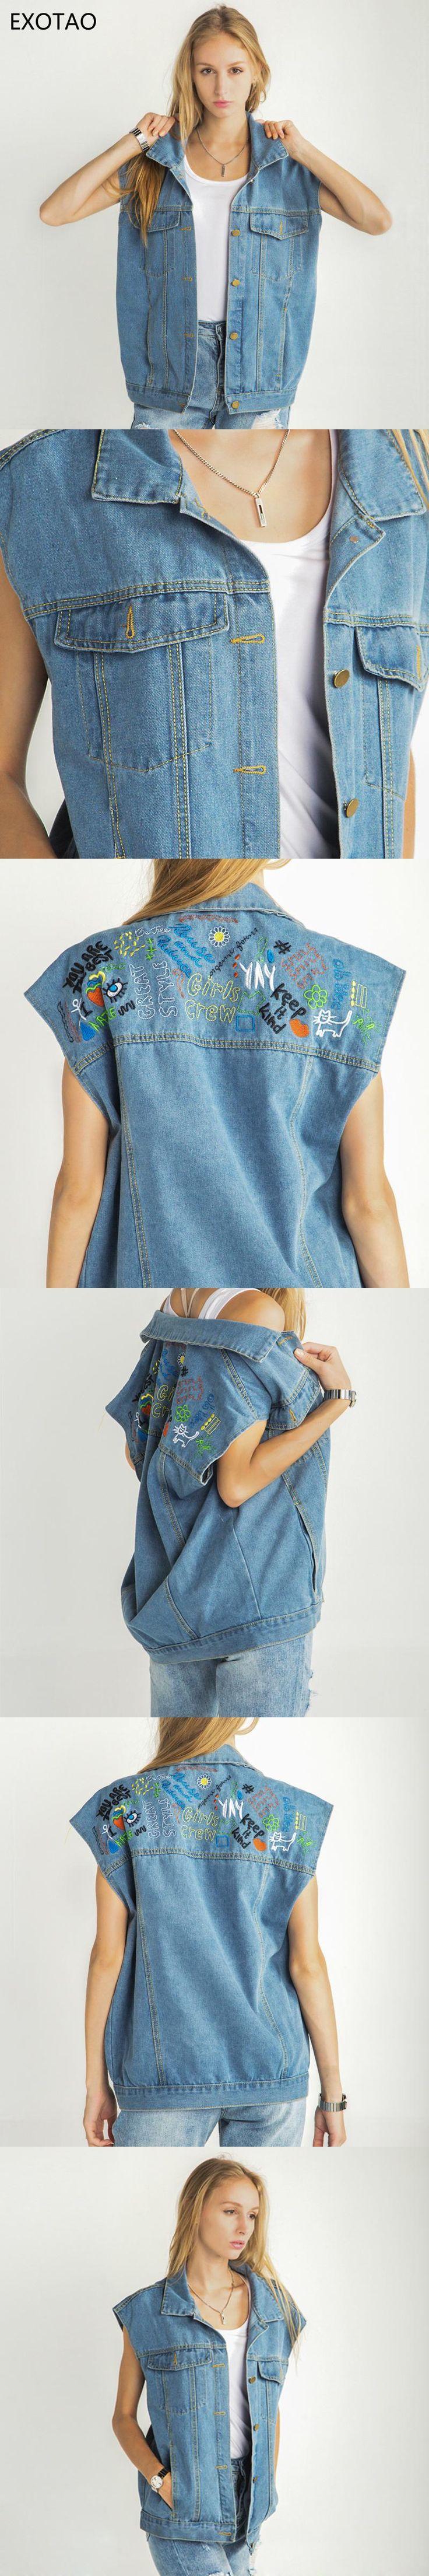 EXOTAO Women Waistcoat Jeans Embroidery Sleeveless Denim Jackets Casual Single Breasted Outwear Loose Ladies Vest Jacket 2017